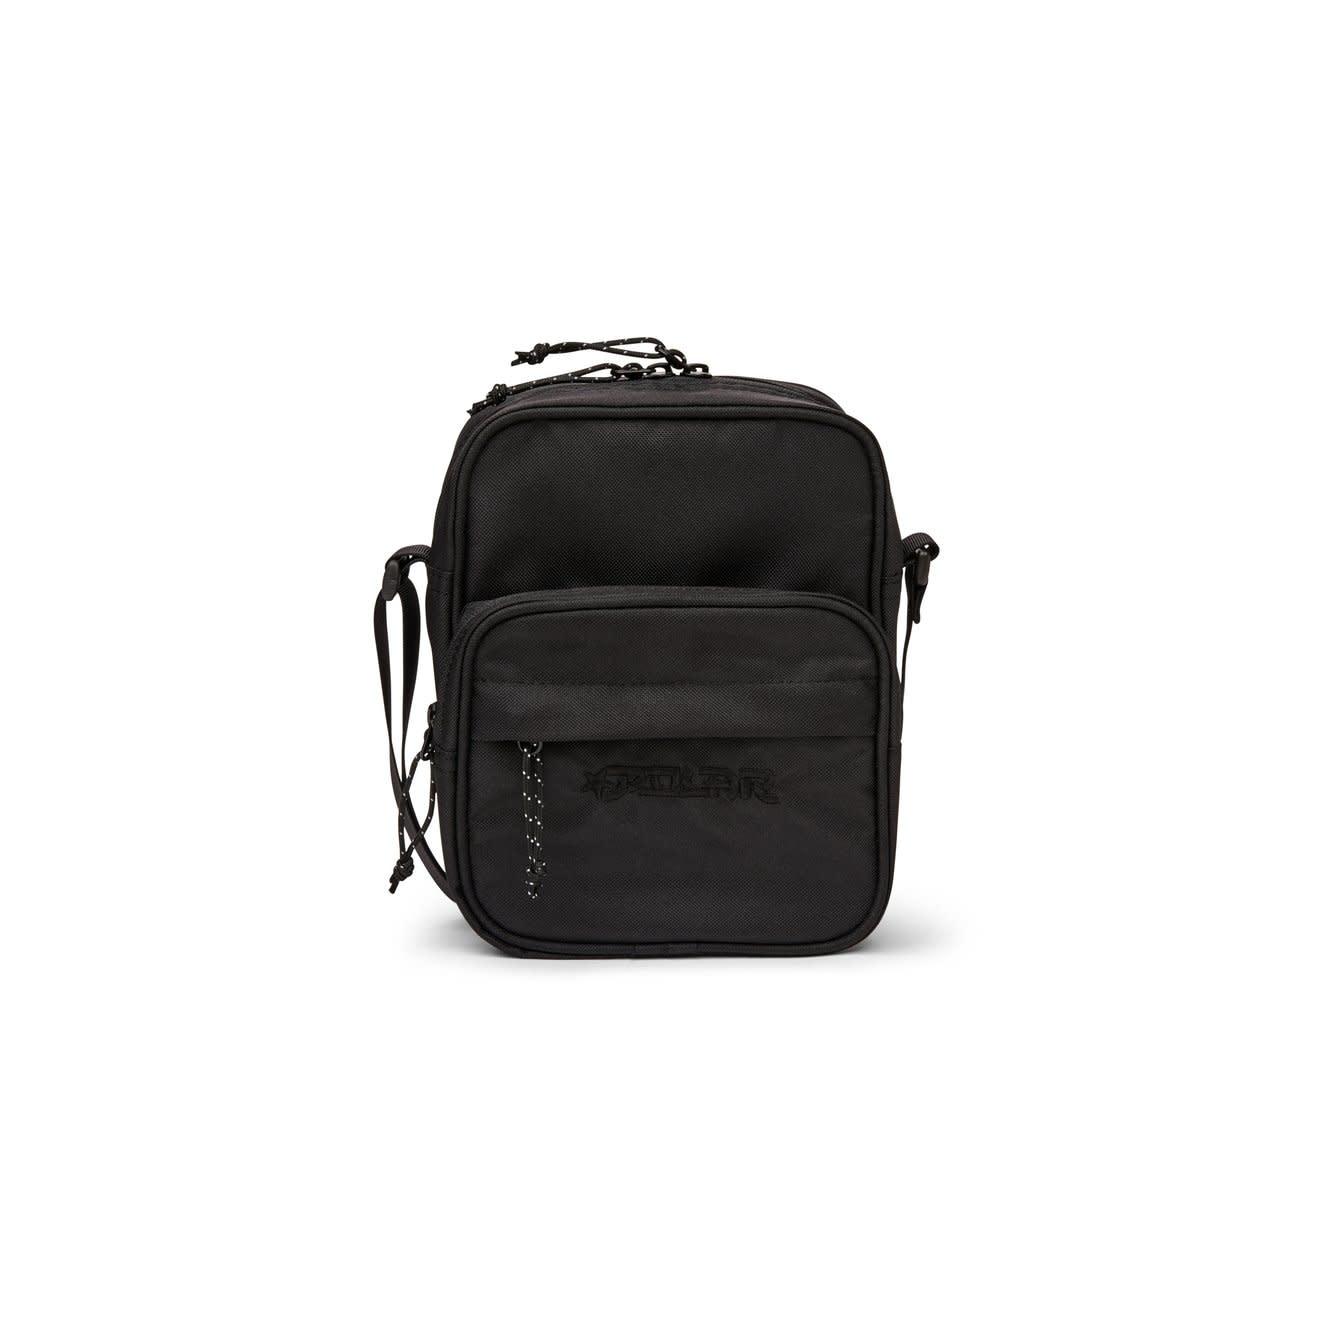 Polar Skate Co. Star Pocket Dealer Bag Black